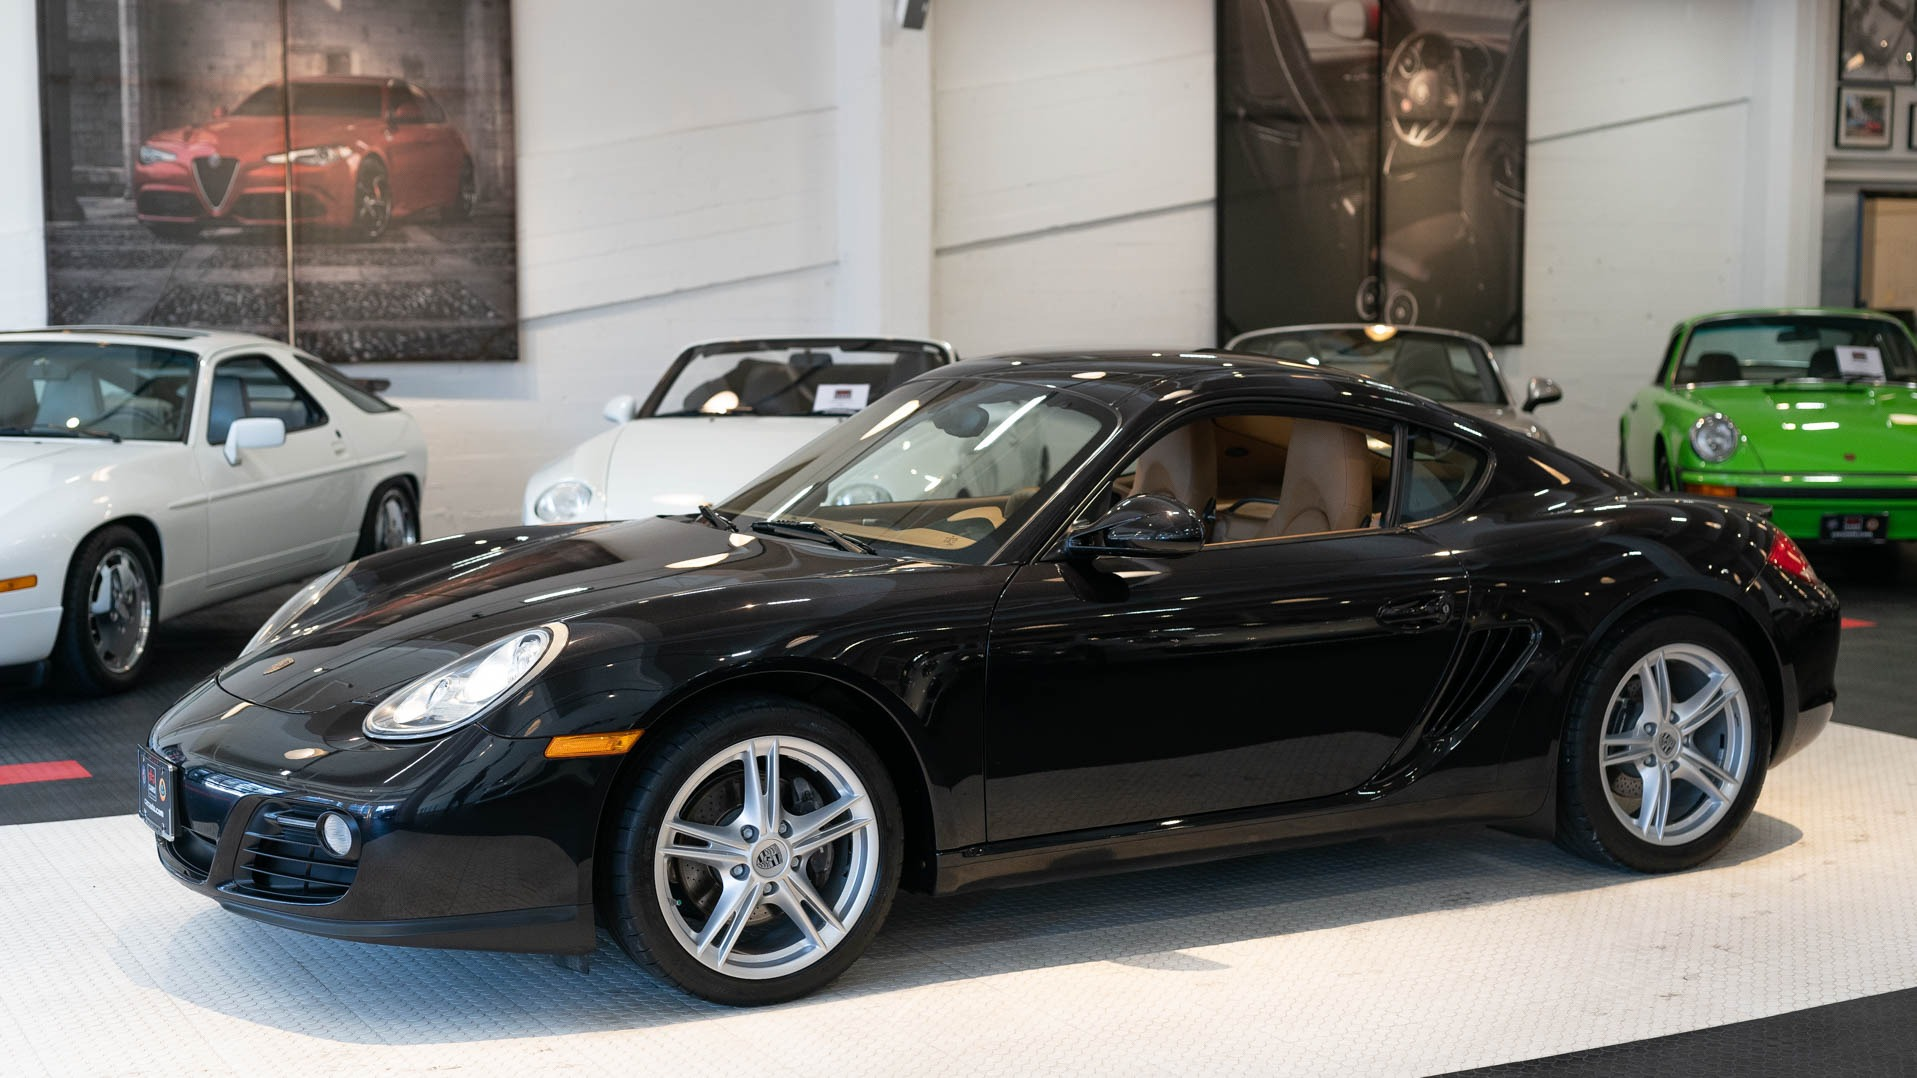 Used 2010 Porsche Cayman For Sale 29 900 Cars Dawydiak Stock